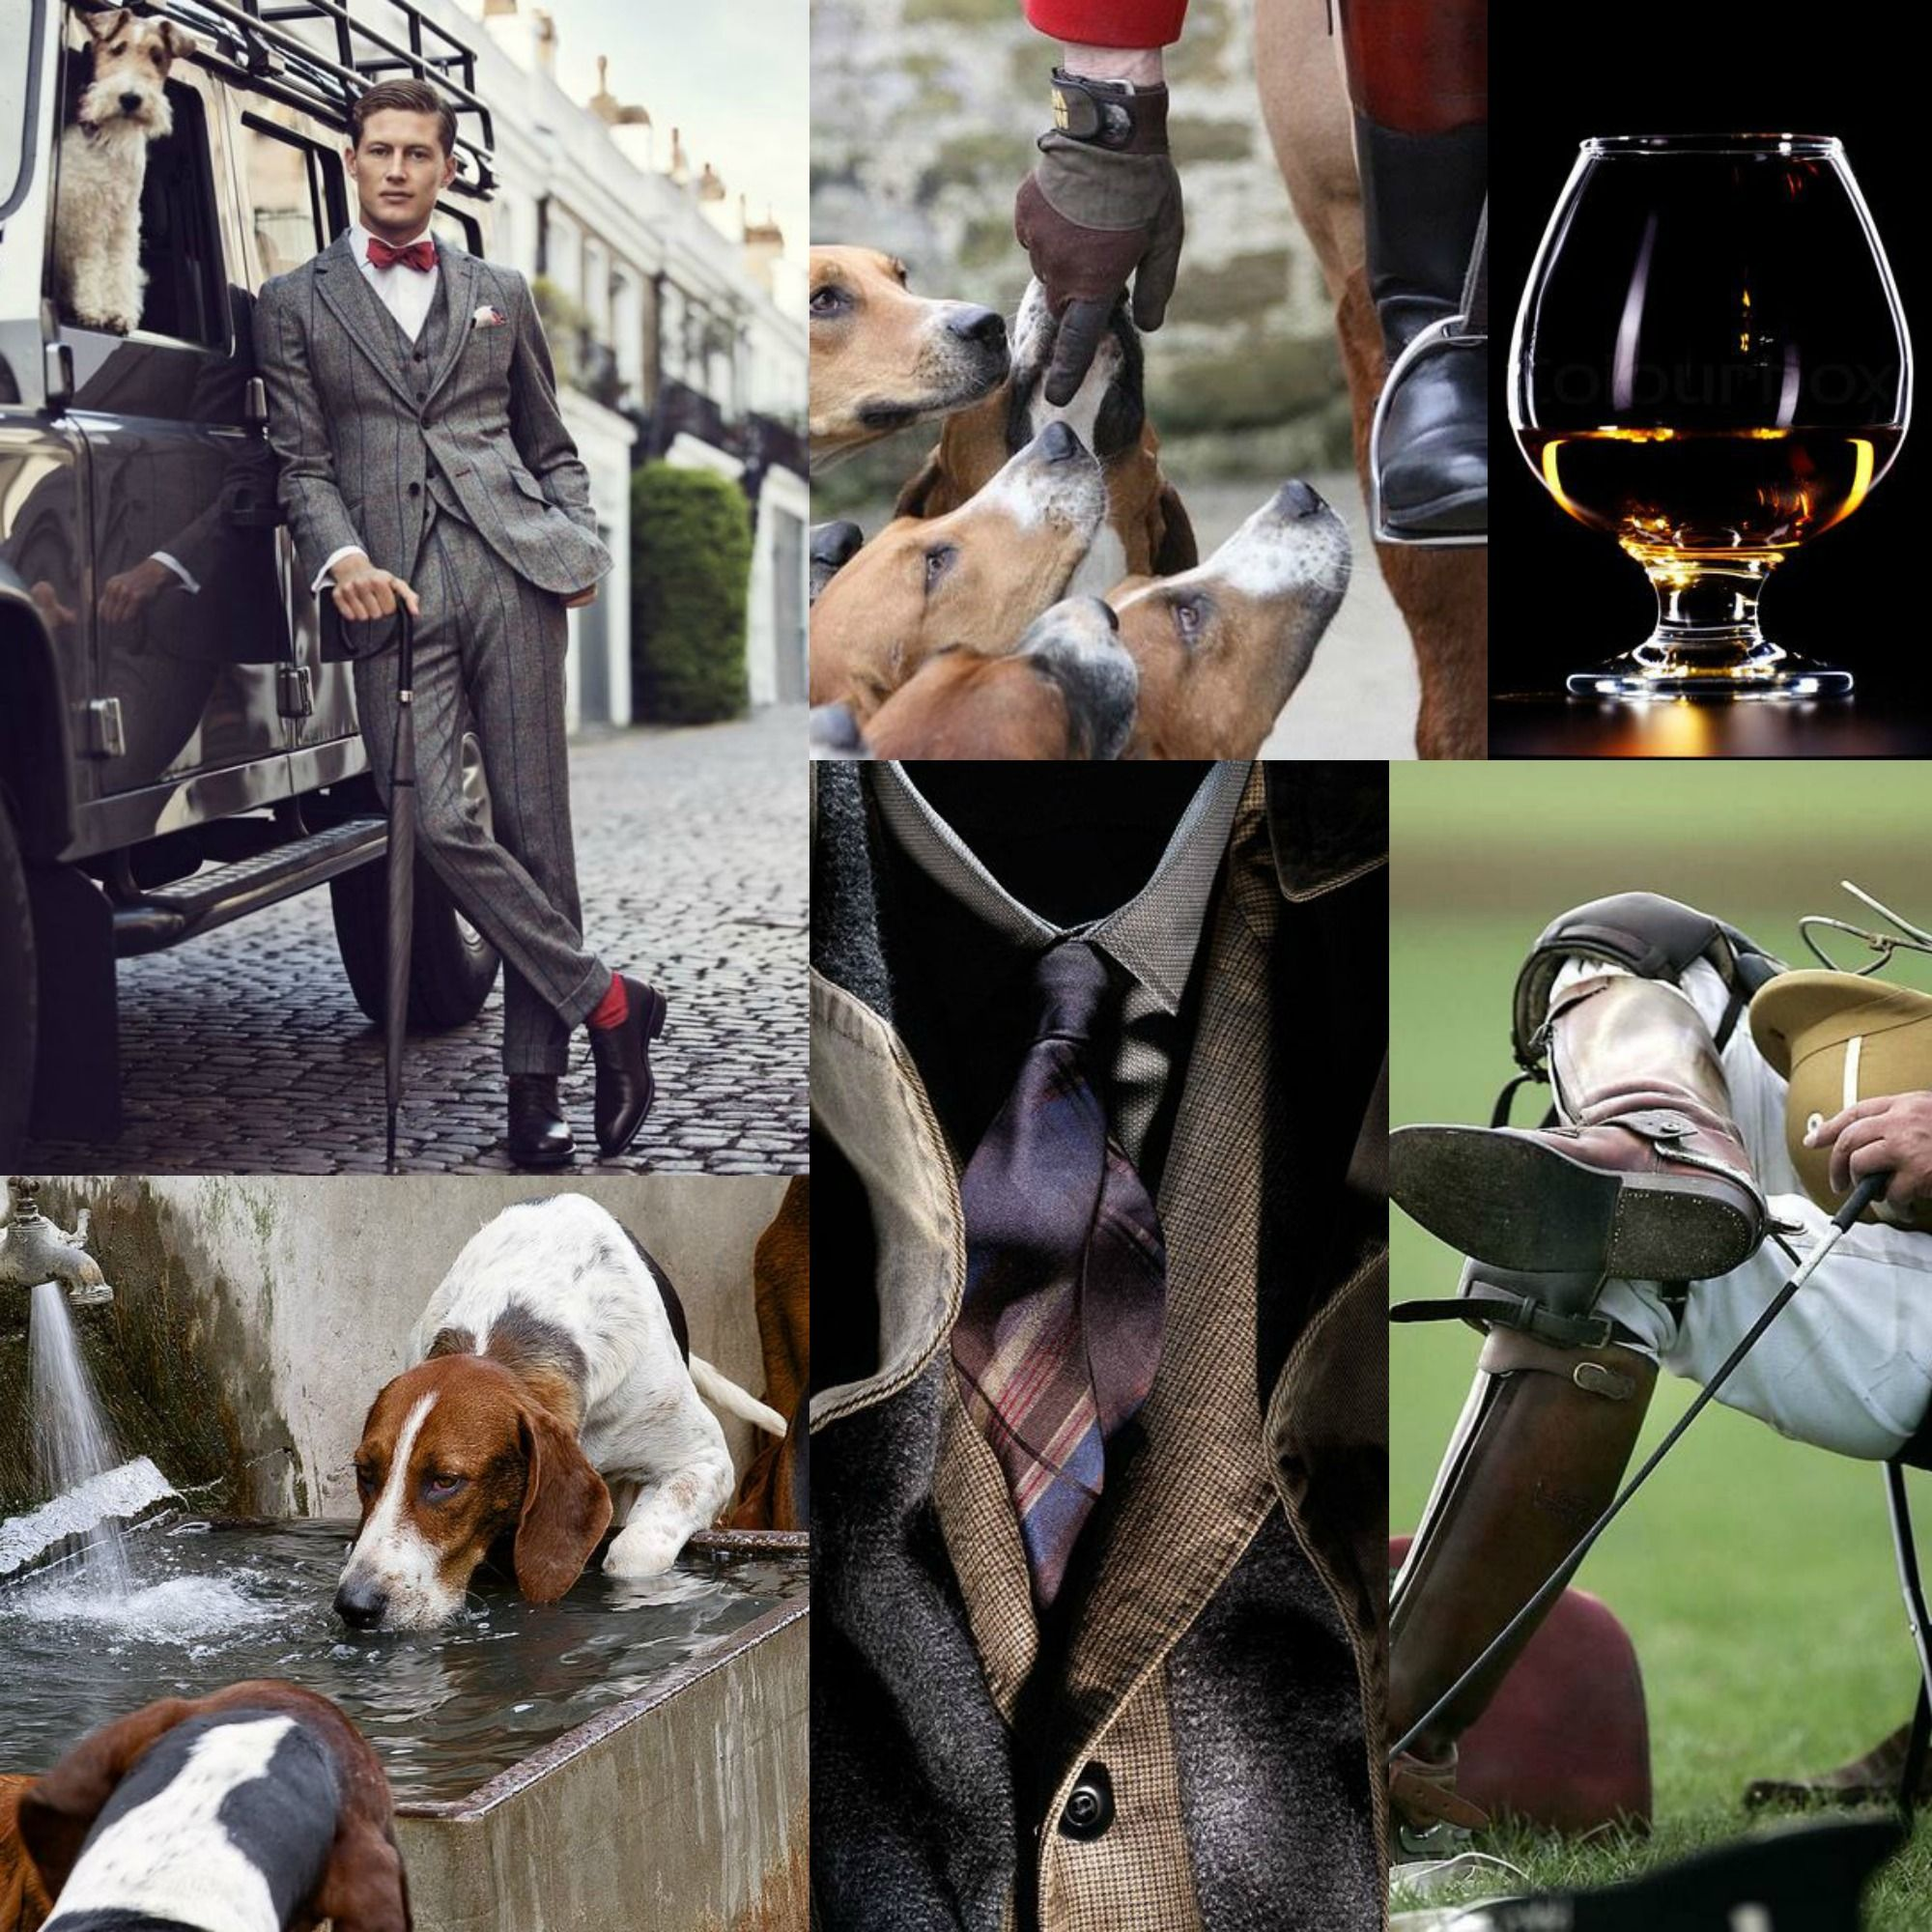 Scottish and Irish twist victorian English cottage fashion love black mourning manor horse men fashionwhisky whiskey tweed dogs riding candle ridingboots. www.ouwbollig.eu https://www.facebook.com/ouwbollig.eu